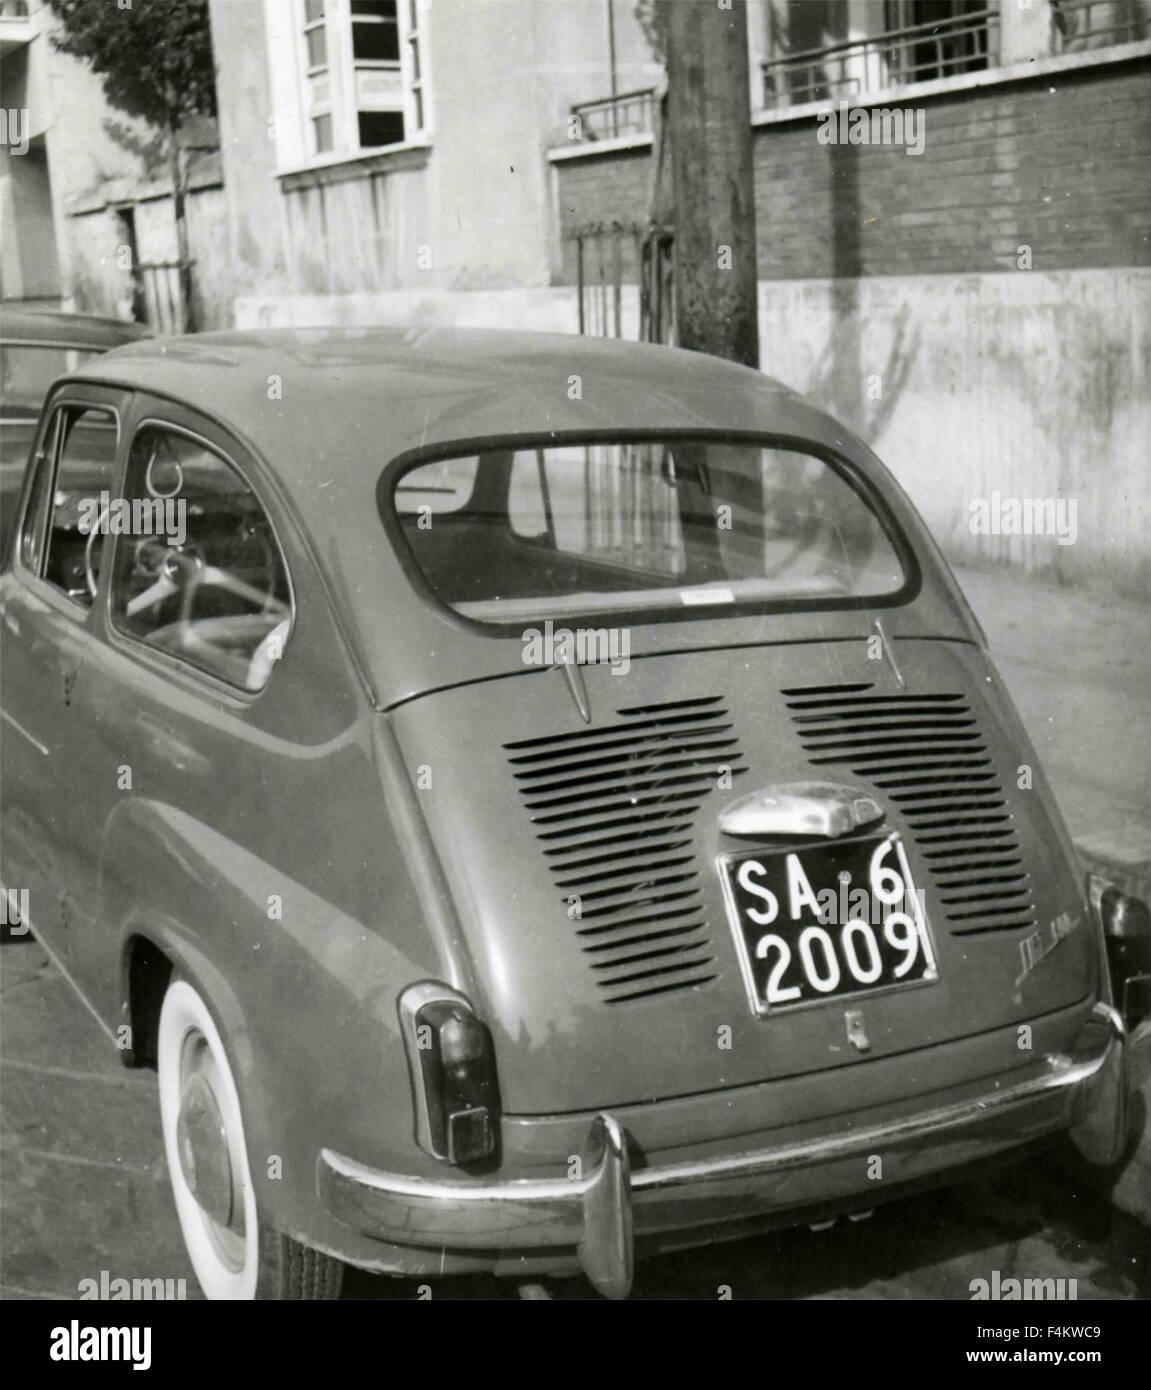 A FIAT 600 car, Italy - Stock Image